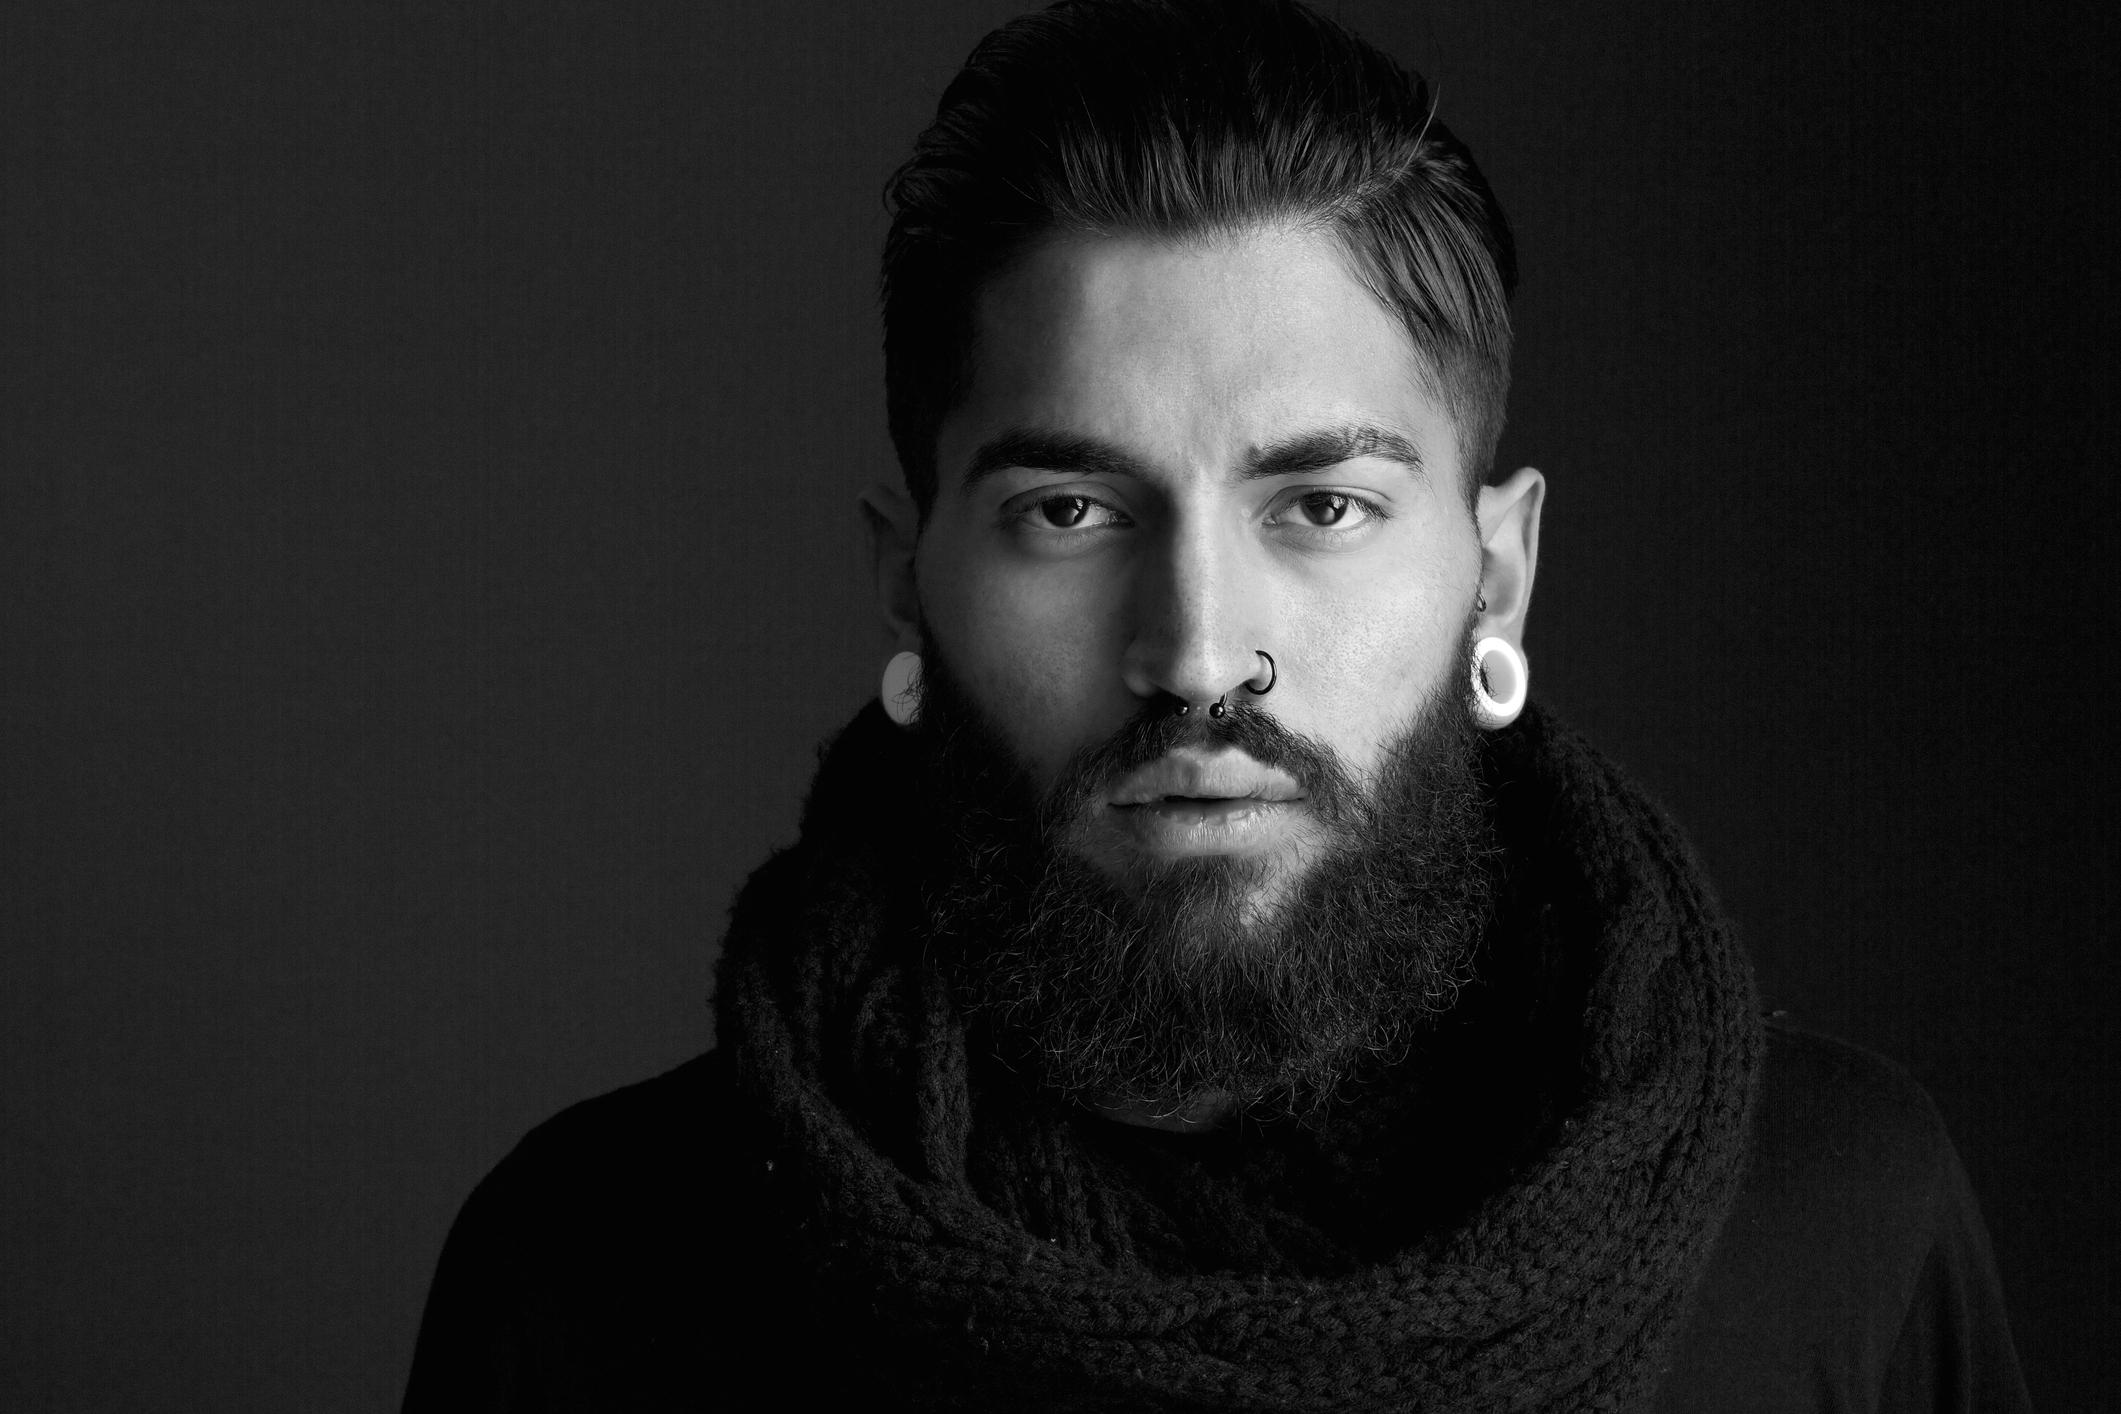 iStock-481701439 man with earrings L.jpg